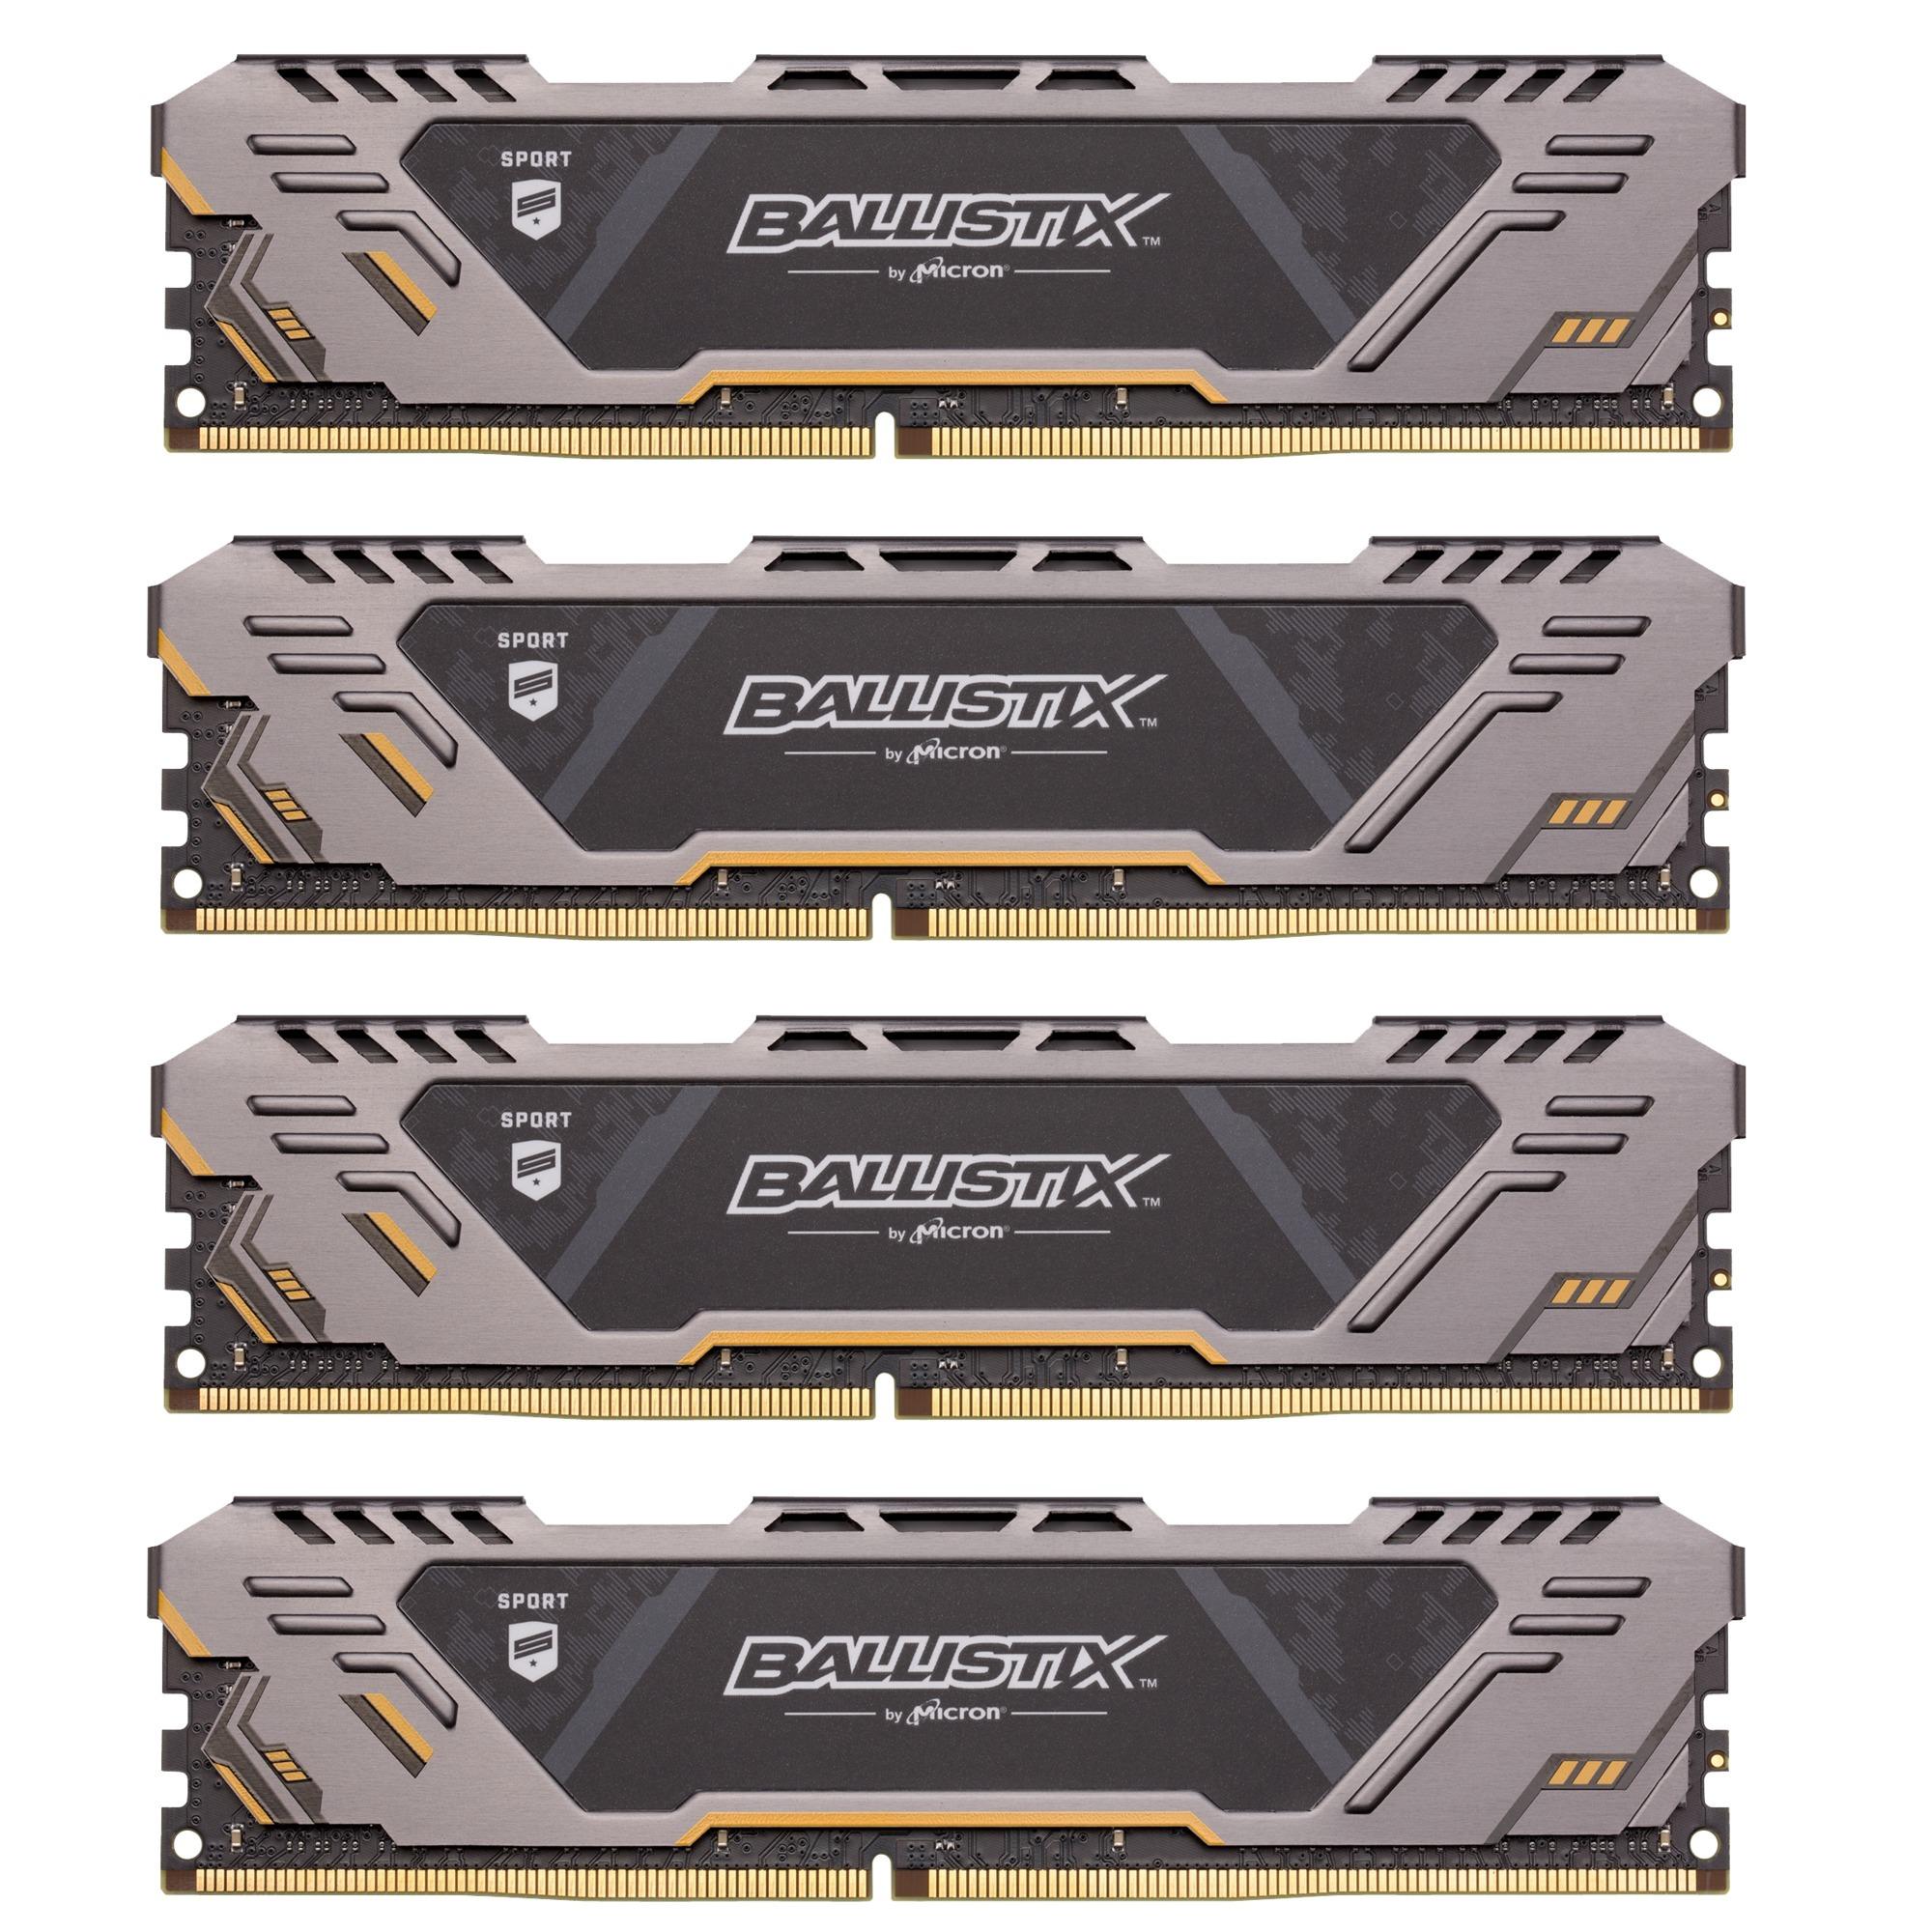 Ballistix Sport AT módulo de memoria 32 GB DDR4 3000 MHz, Memoria RAM